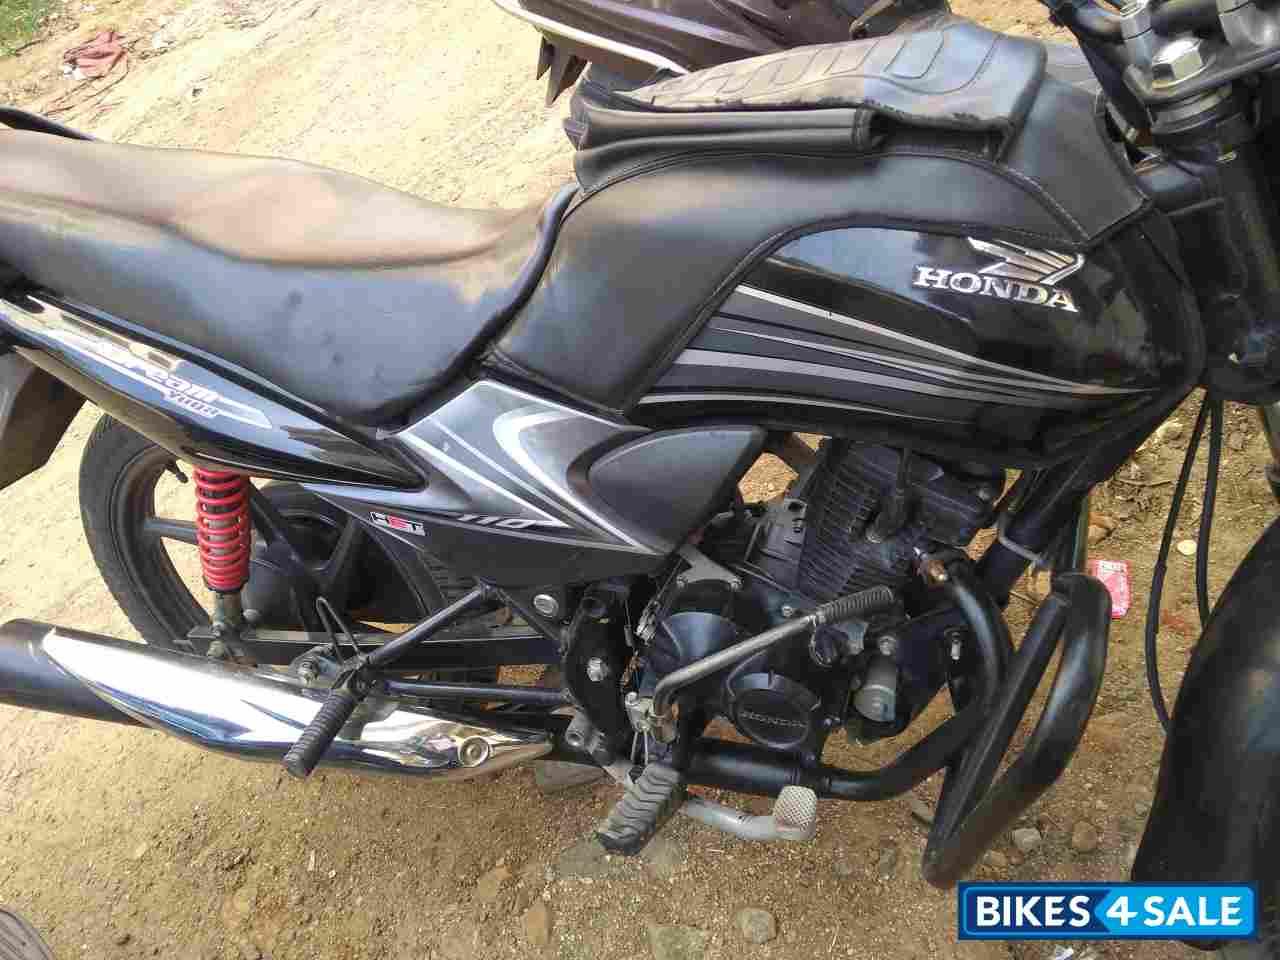 Used 2015 Model Honda Dream Yuga For Sale In Chennai Id 183205 Grey Colour Bikes4sale